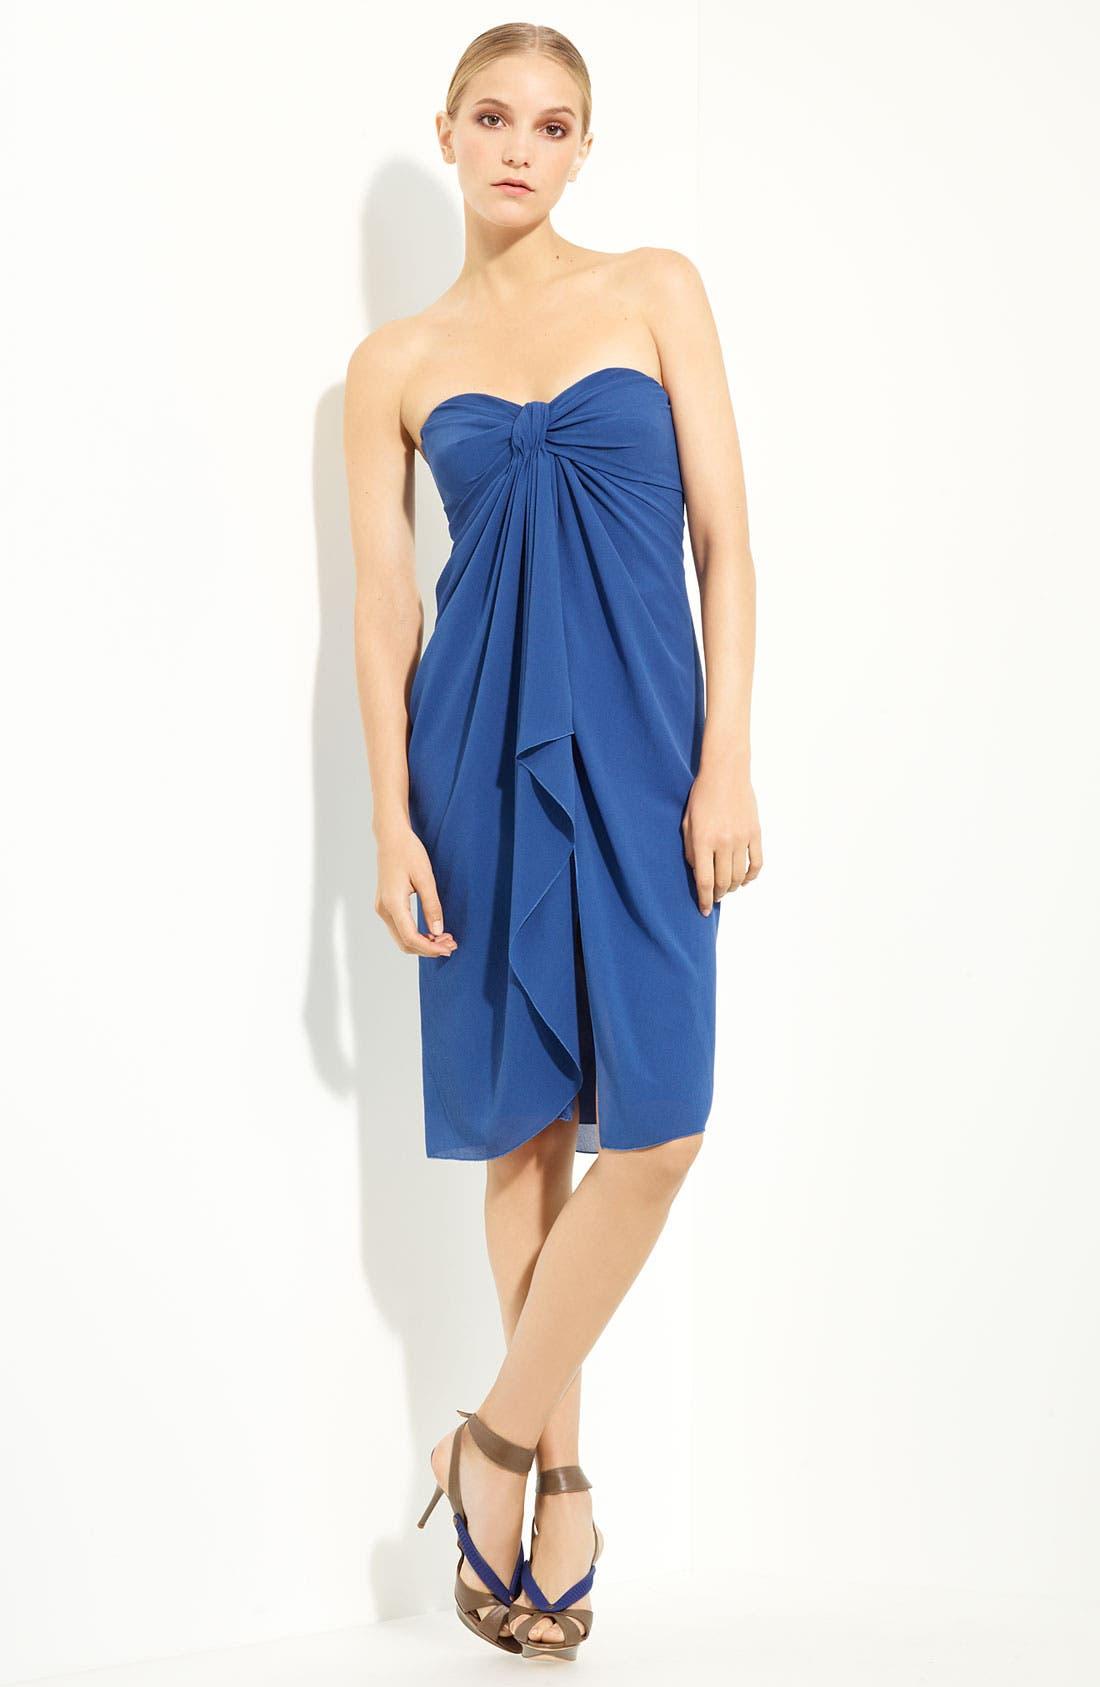 Main Image - Jean Paul Gaultier Strapless Knit Dress